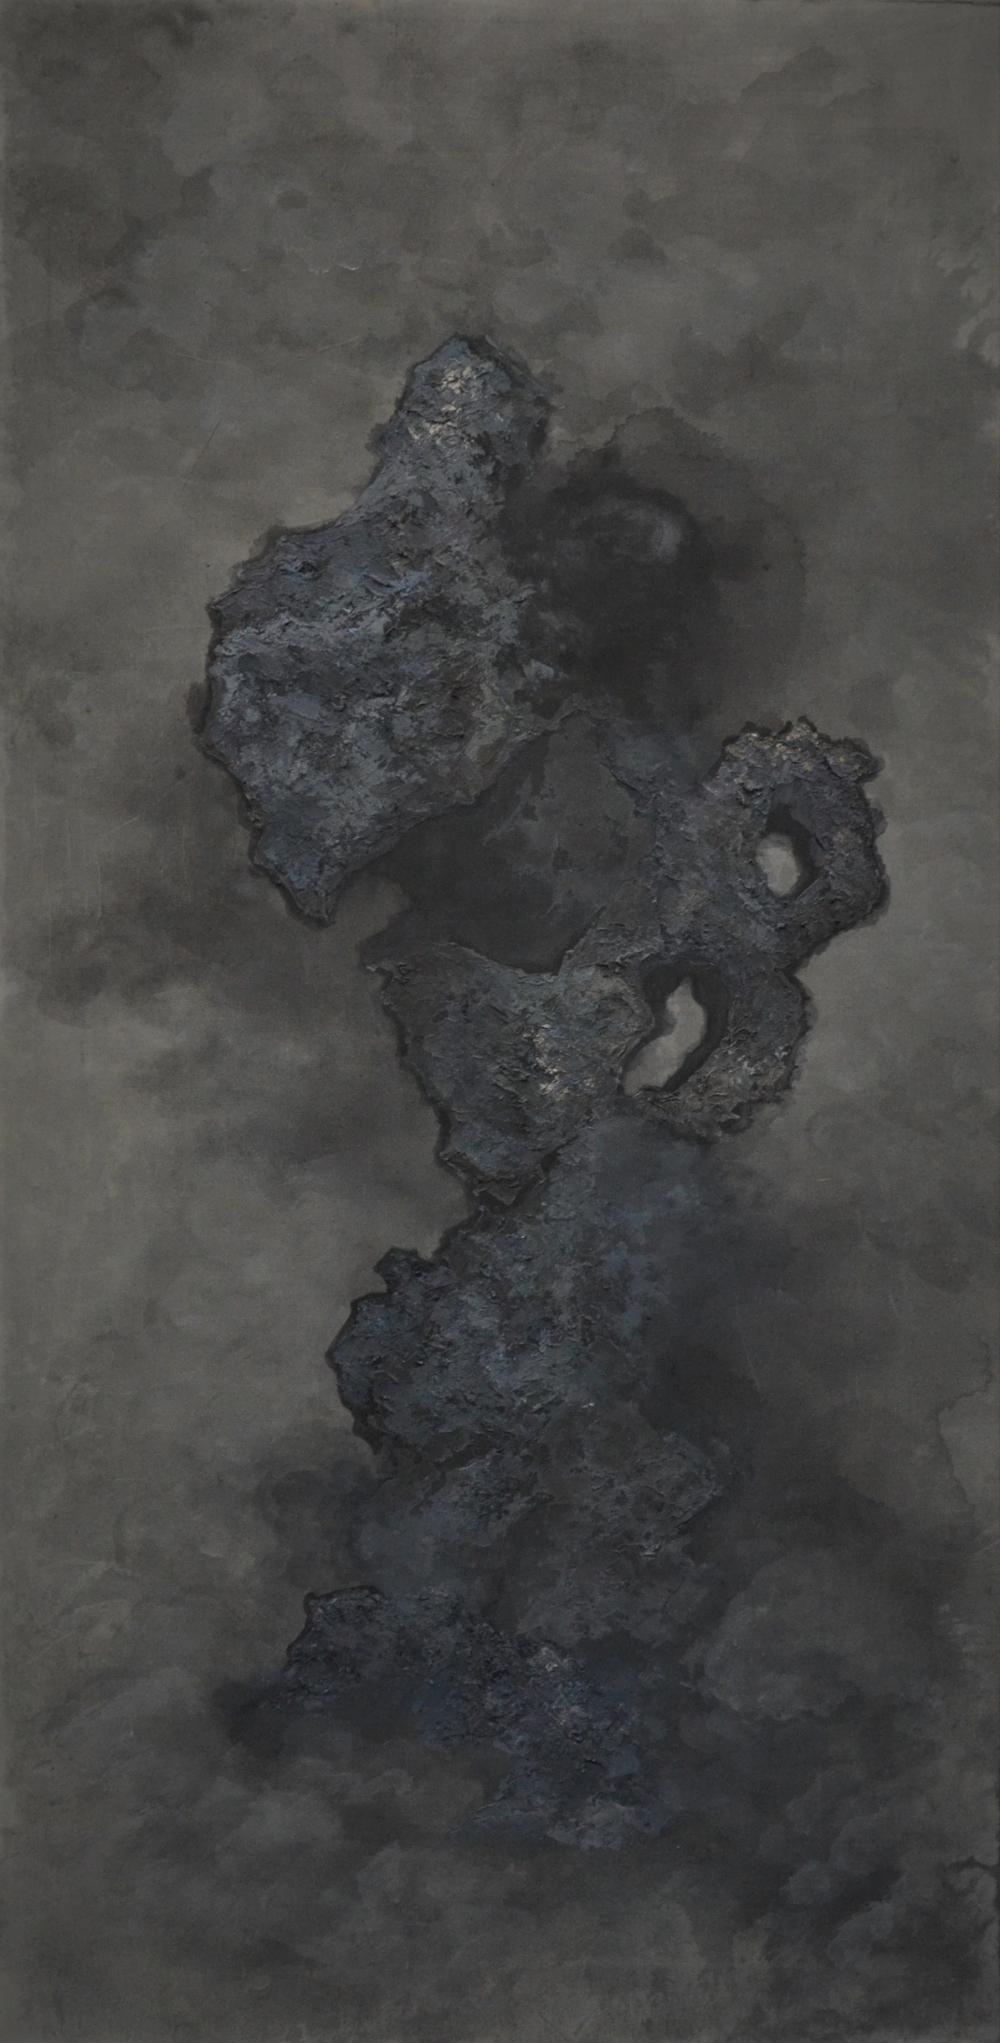 exid259wid187 / 太湖石